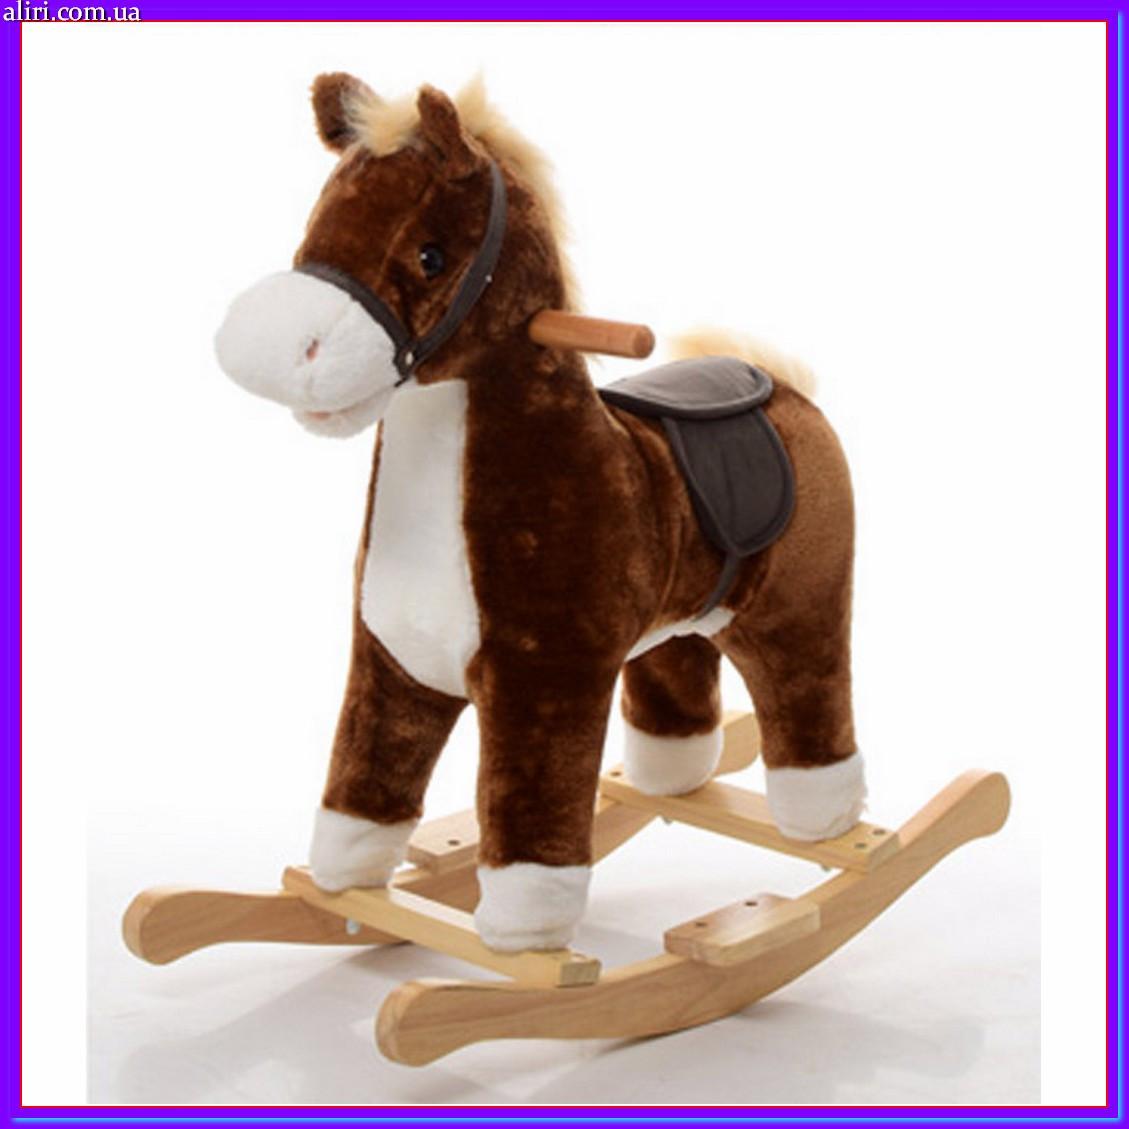 Плюшевая музыкальная лошадка — качалка